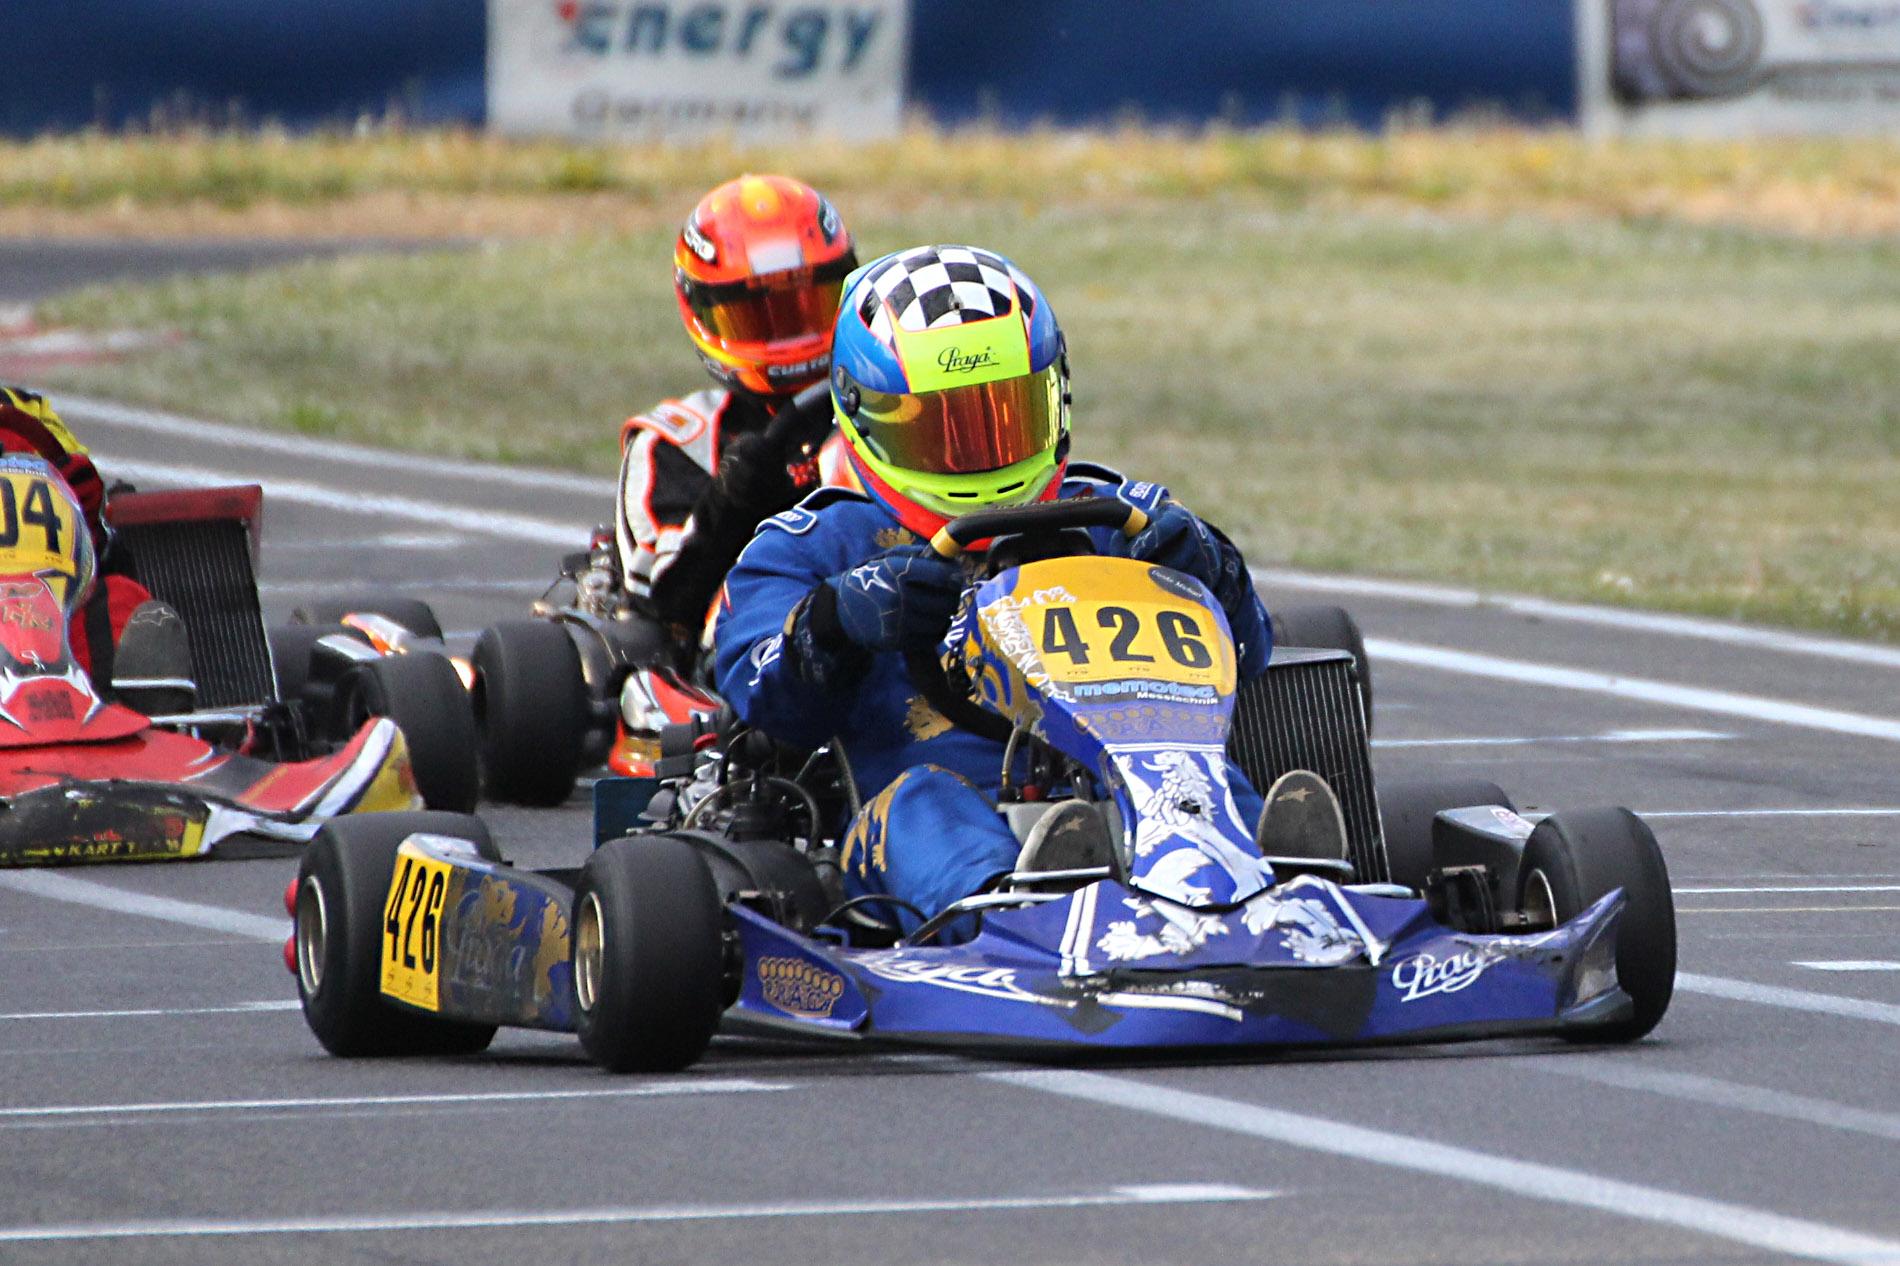 M-Tec Praga Racing takes double Triumph at RMC-Opening